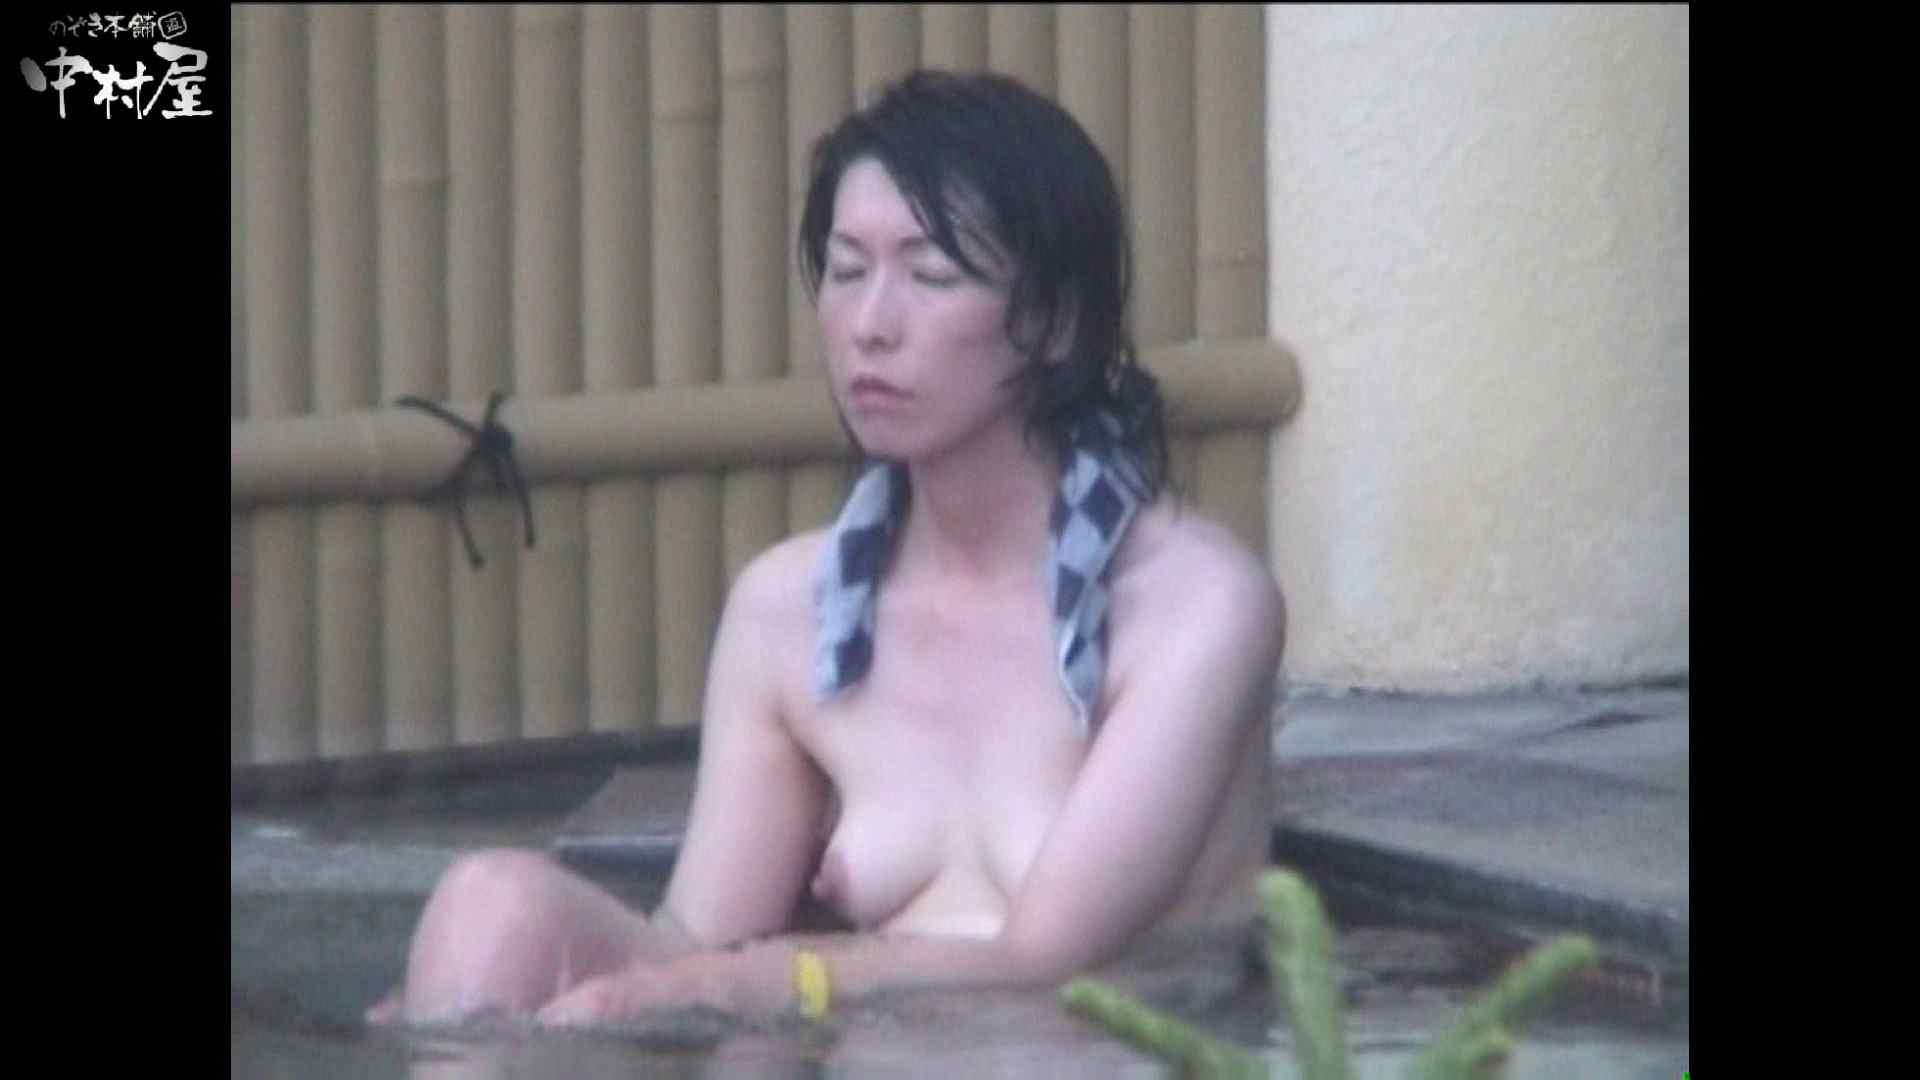 Aquaな露天風呂Vol.987 露天 オマンコ無修正動画無料 71画像 38